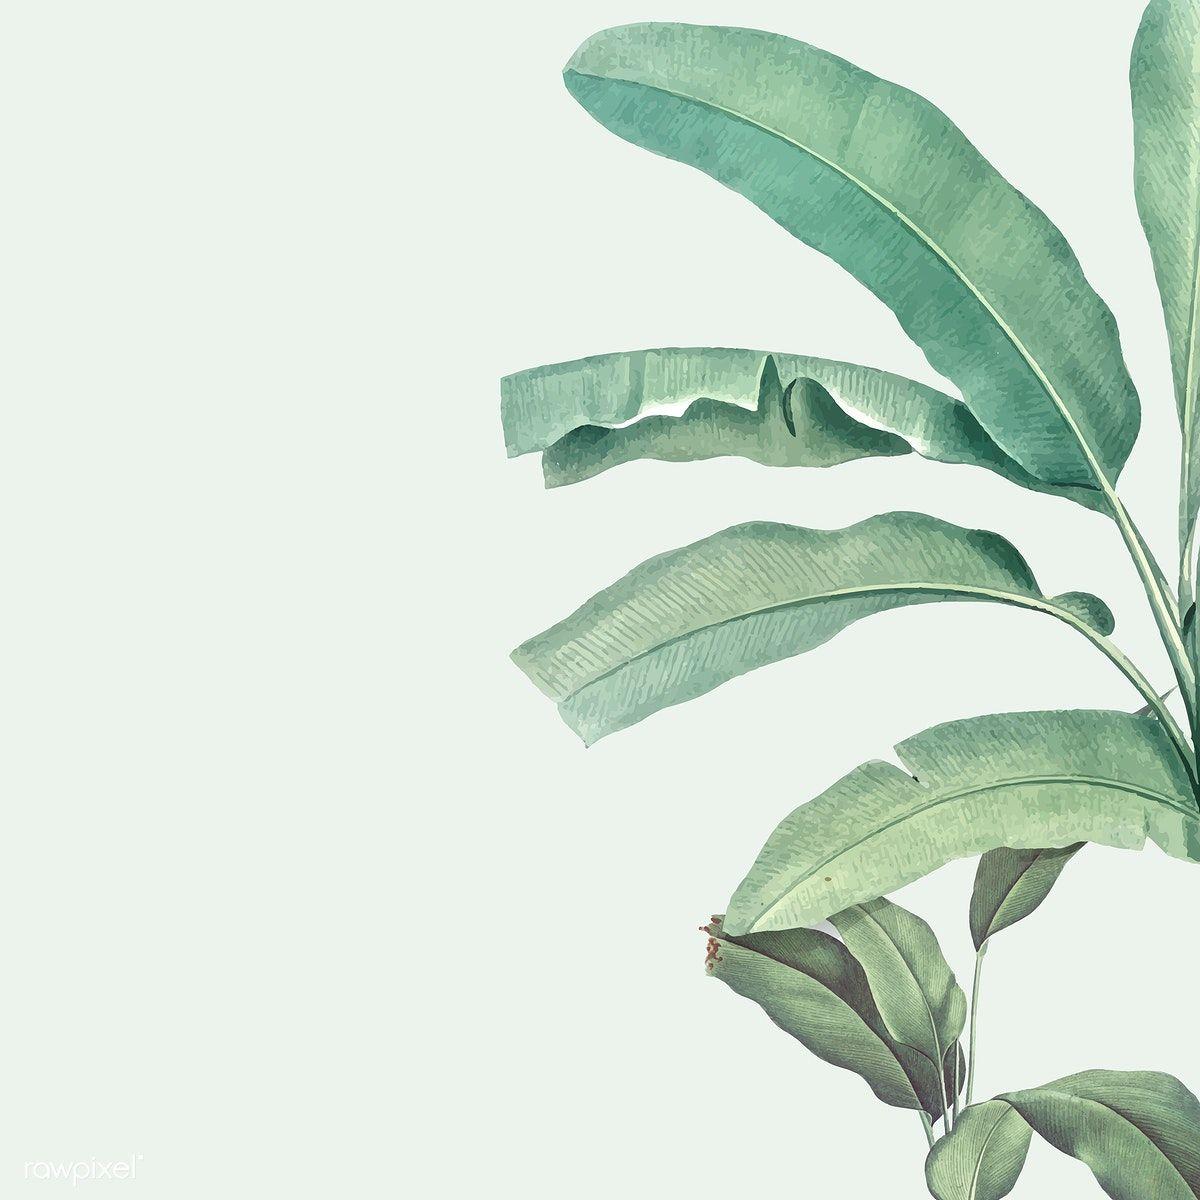 Download Premium Vector Of Border With Banana Tree Illustration 555474 Tree Illustration Banana Tree Illustration